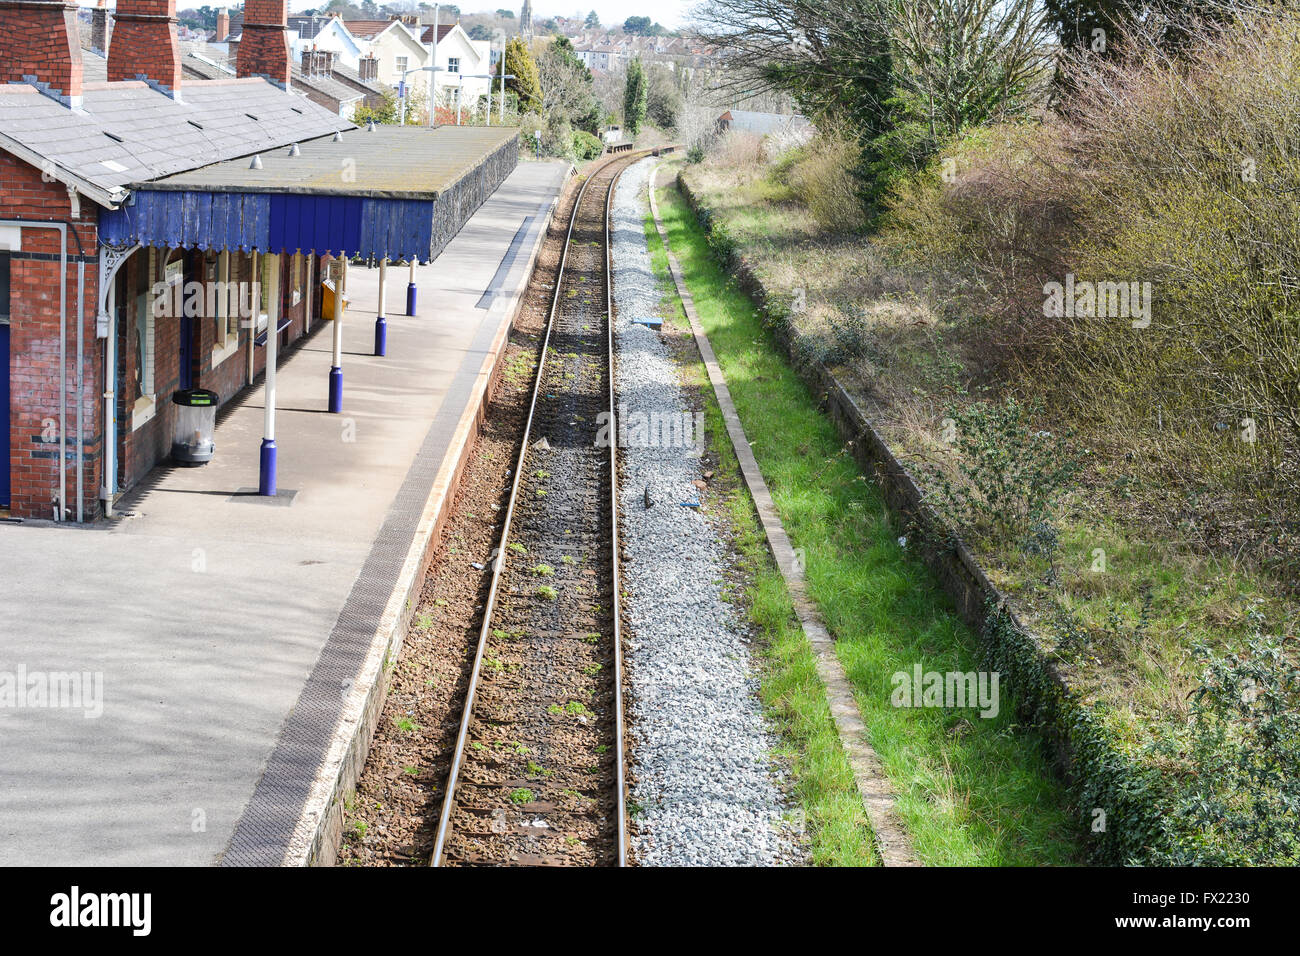 rail track and train station in Redland, Bristol - Stock Image